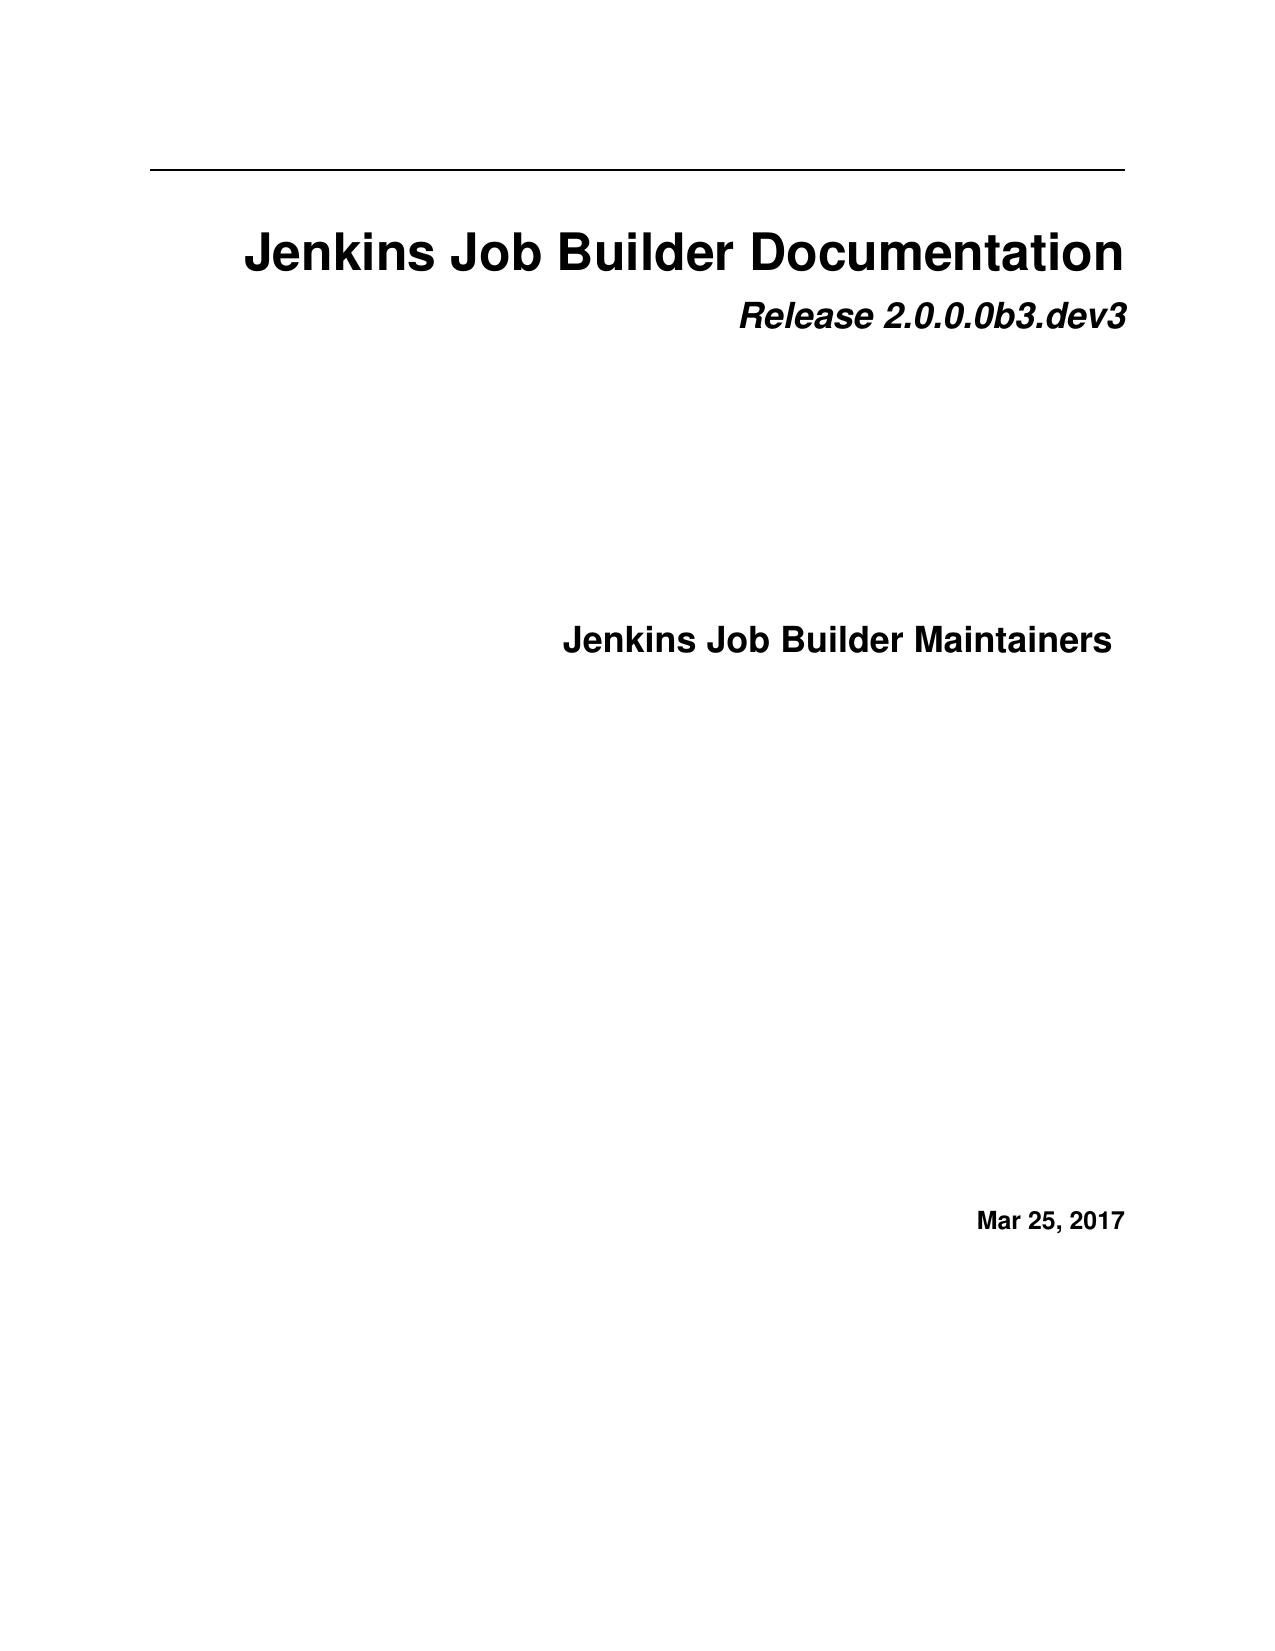 Jenkins Job Builder Documentation | manualzz com